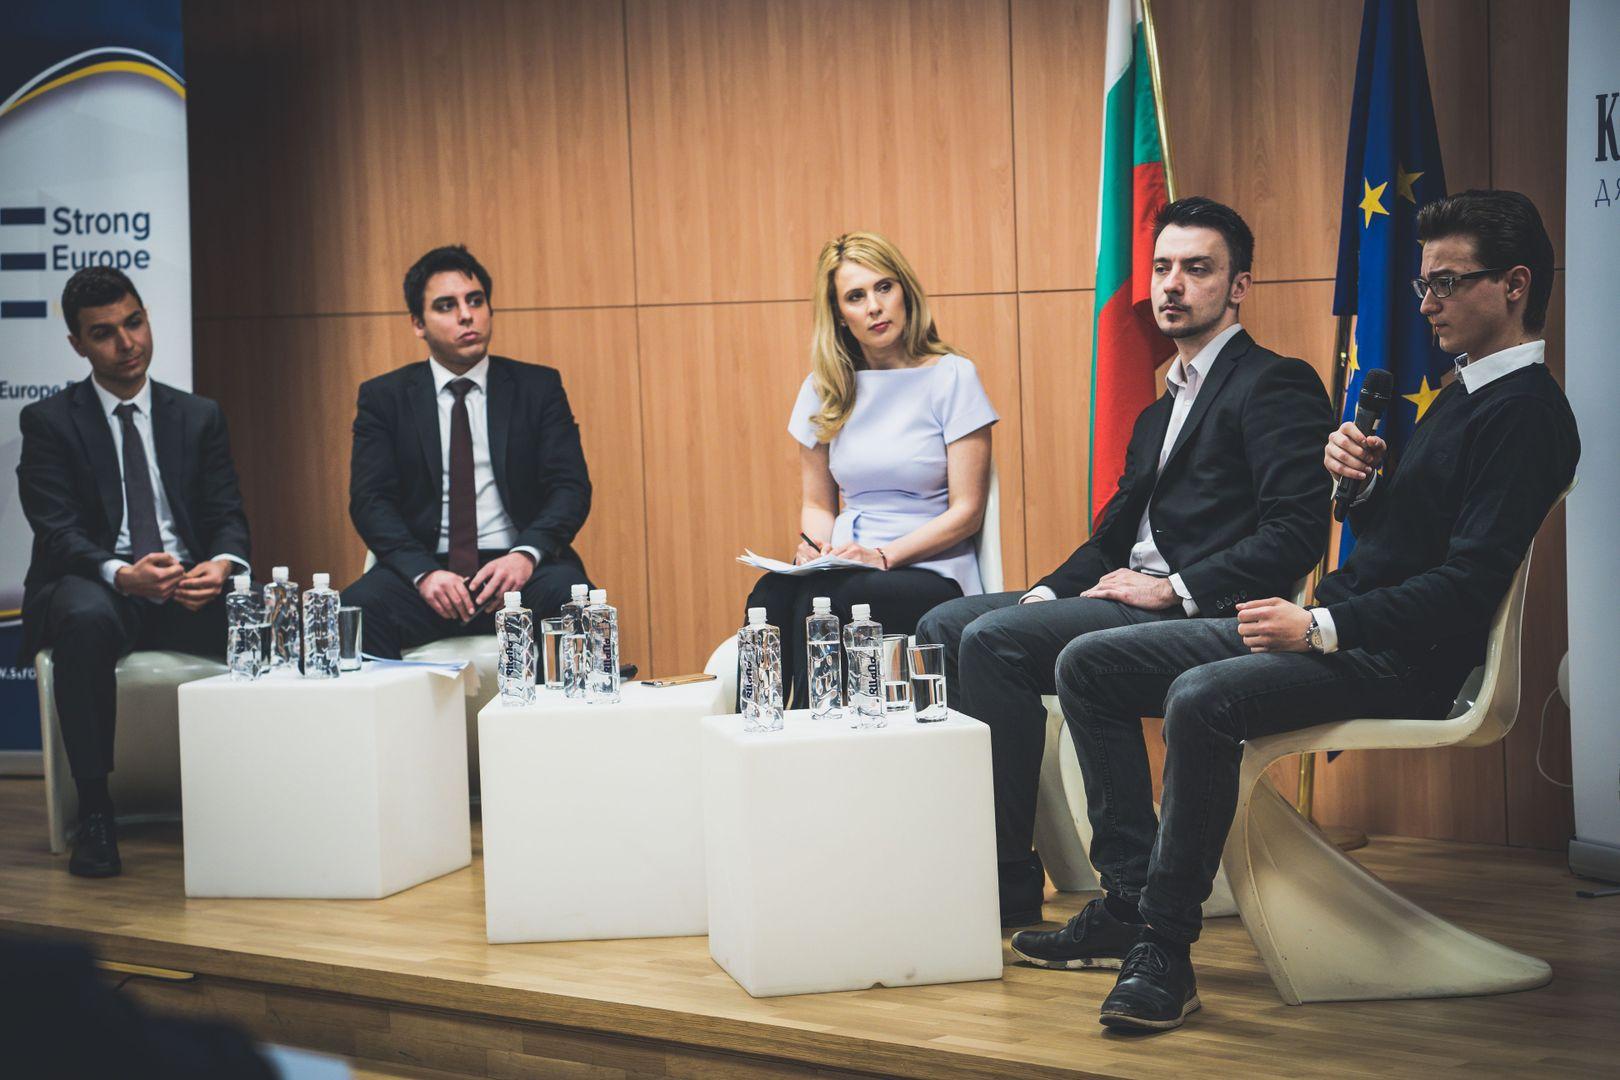 conservative-millenium-strongeurope-event-april-33